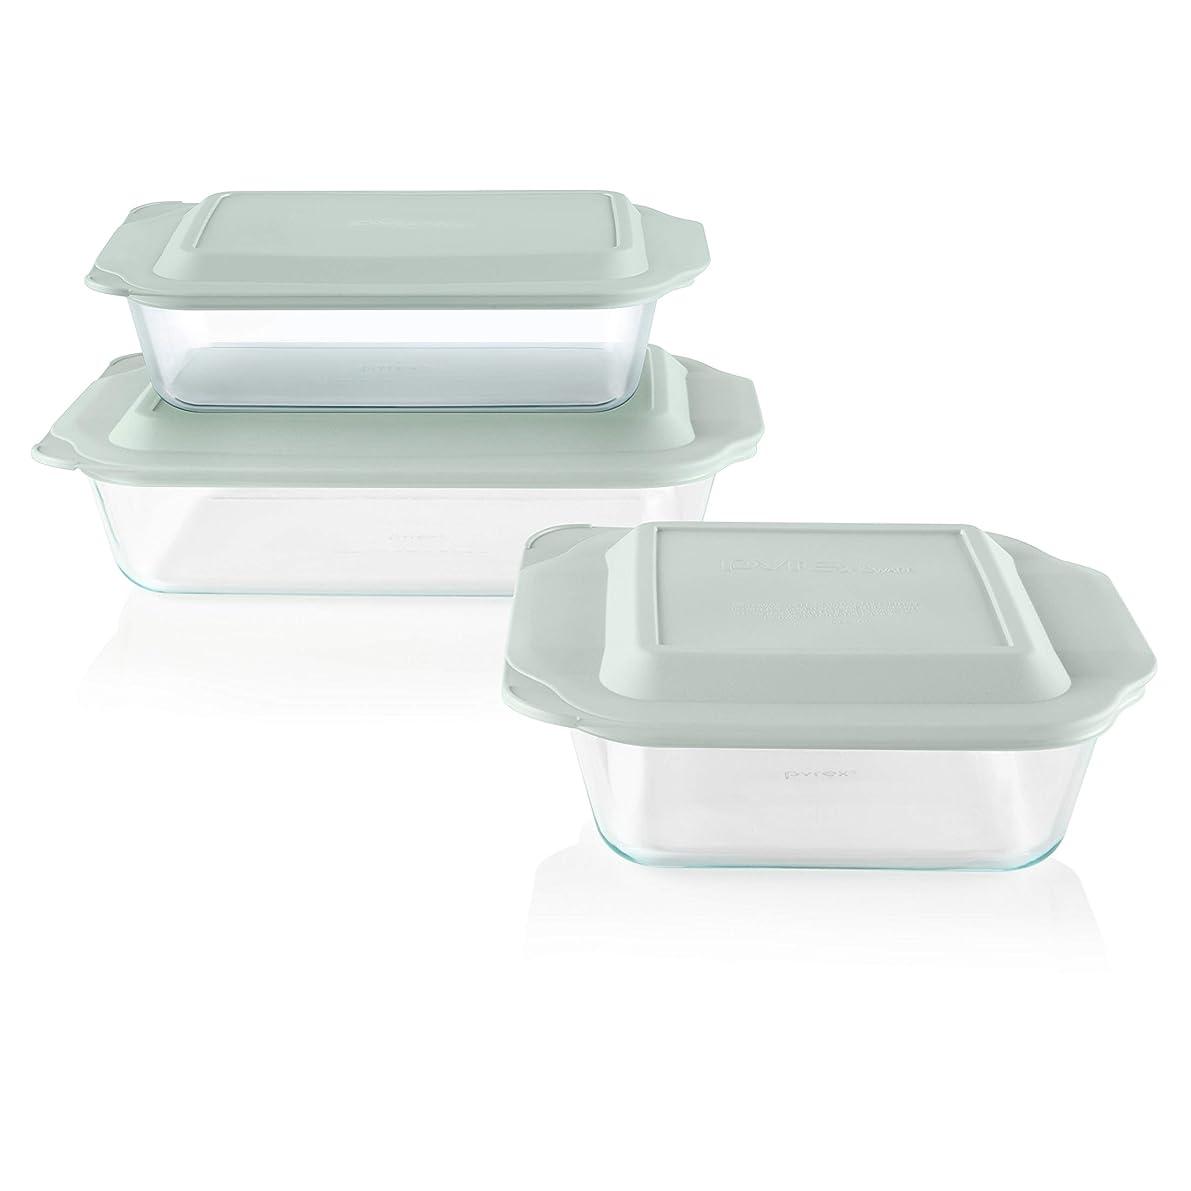 Pyrex Deep Baking Dish Set (6-piece, BPA-free Lids)